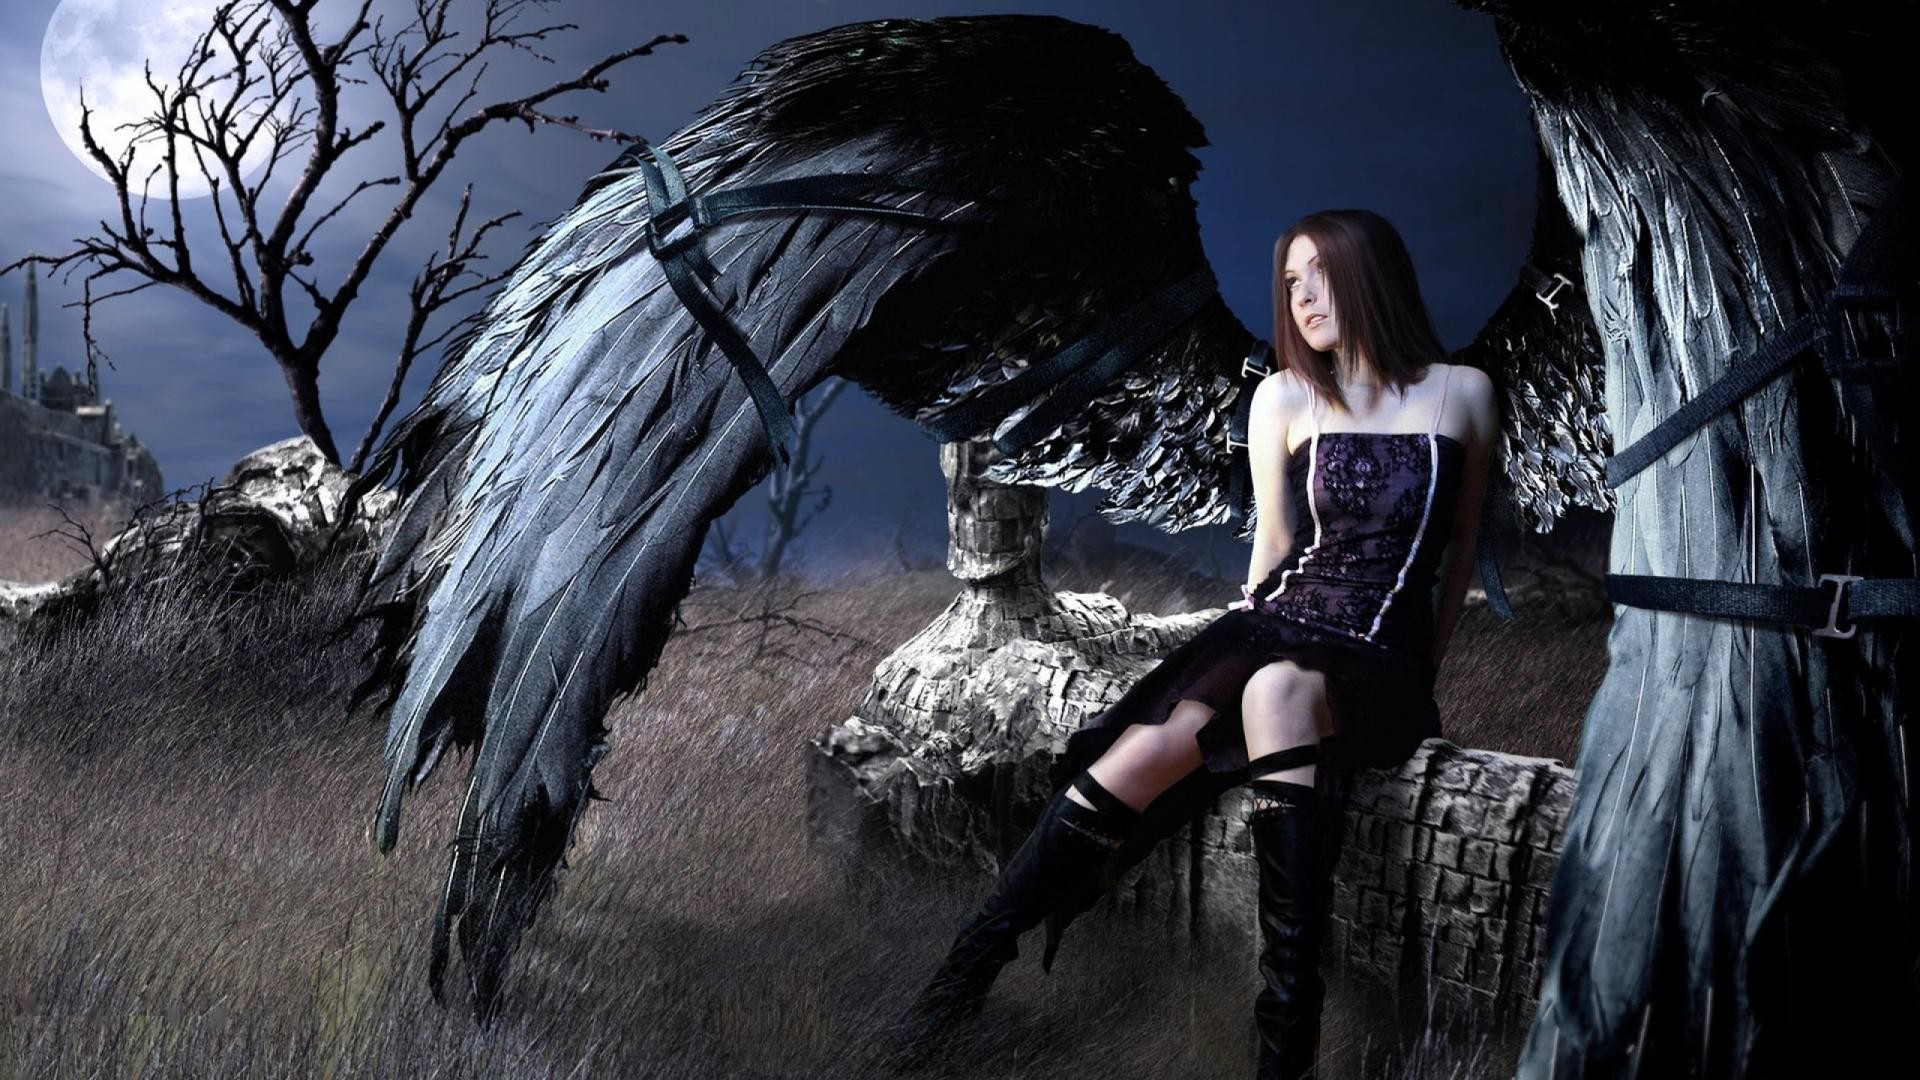 Outstanding Black Angel Wallpaper 1920x1080px